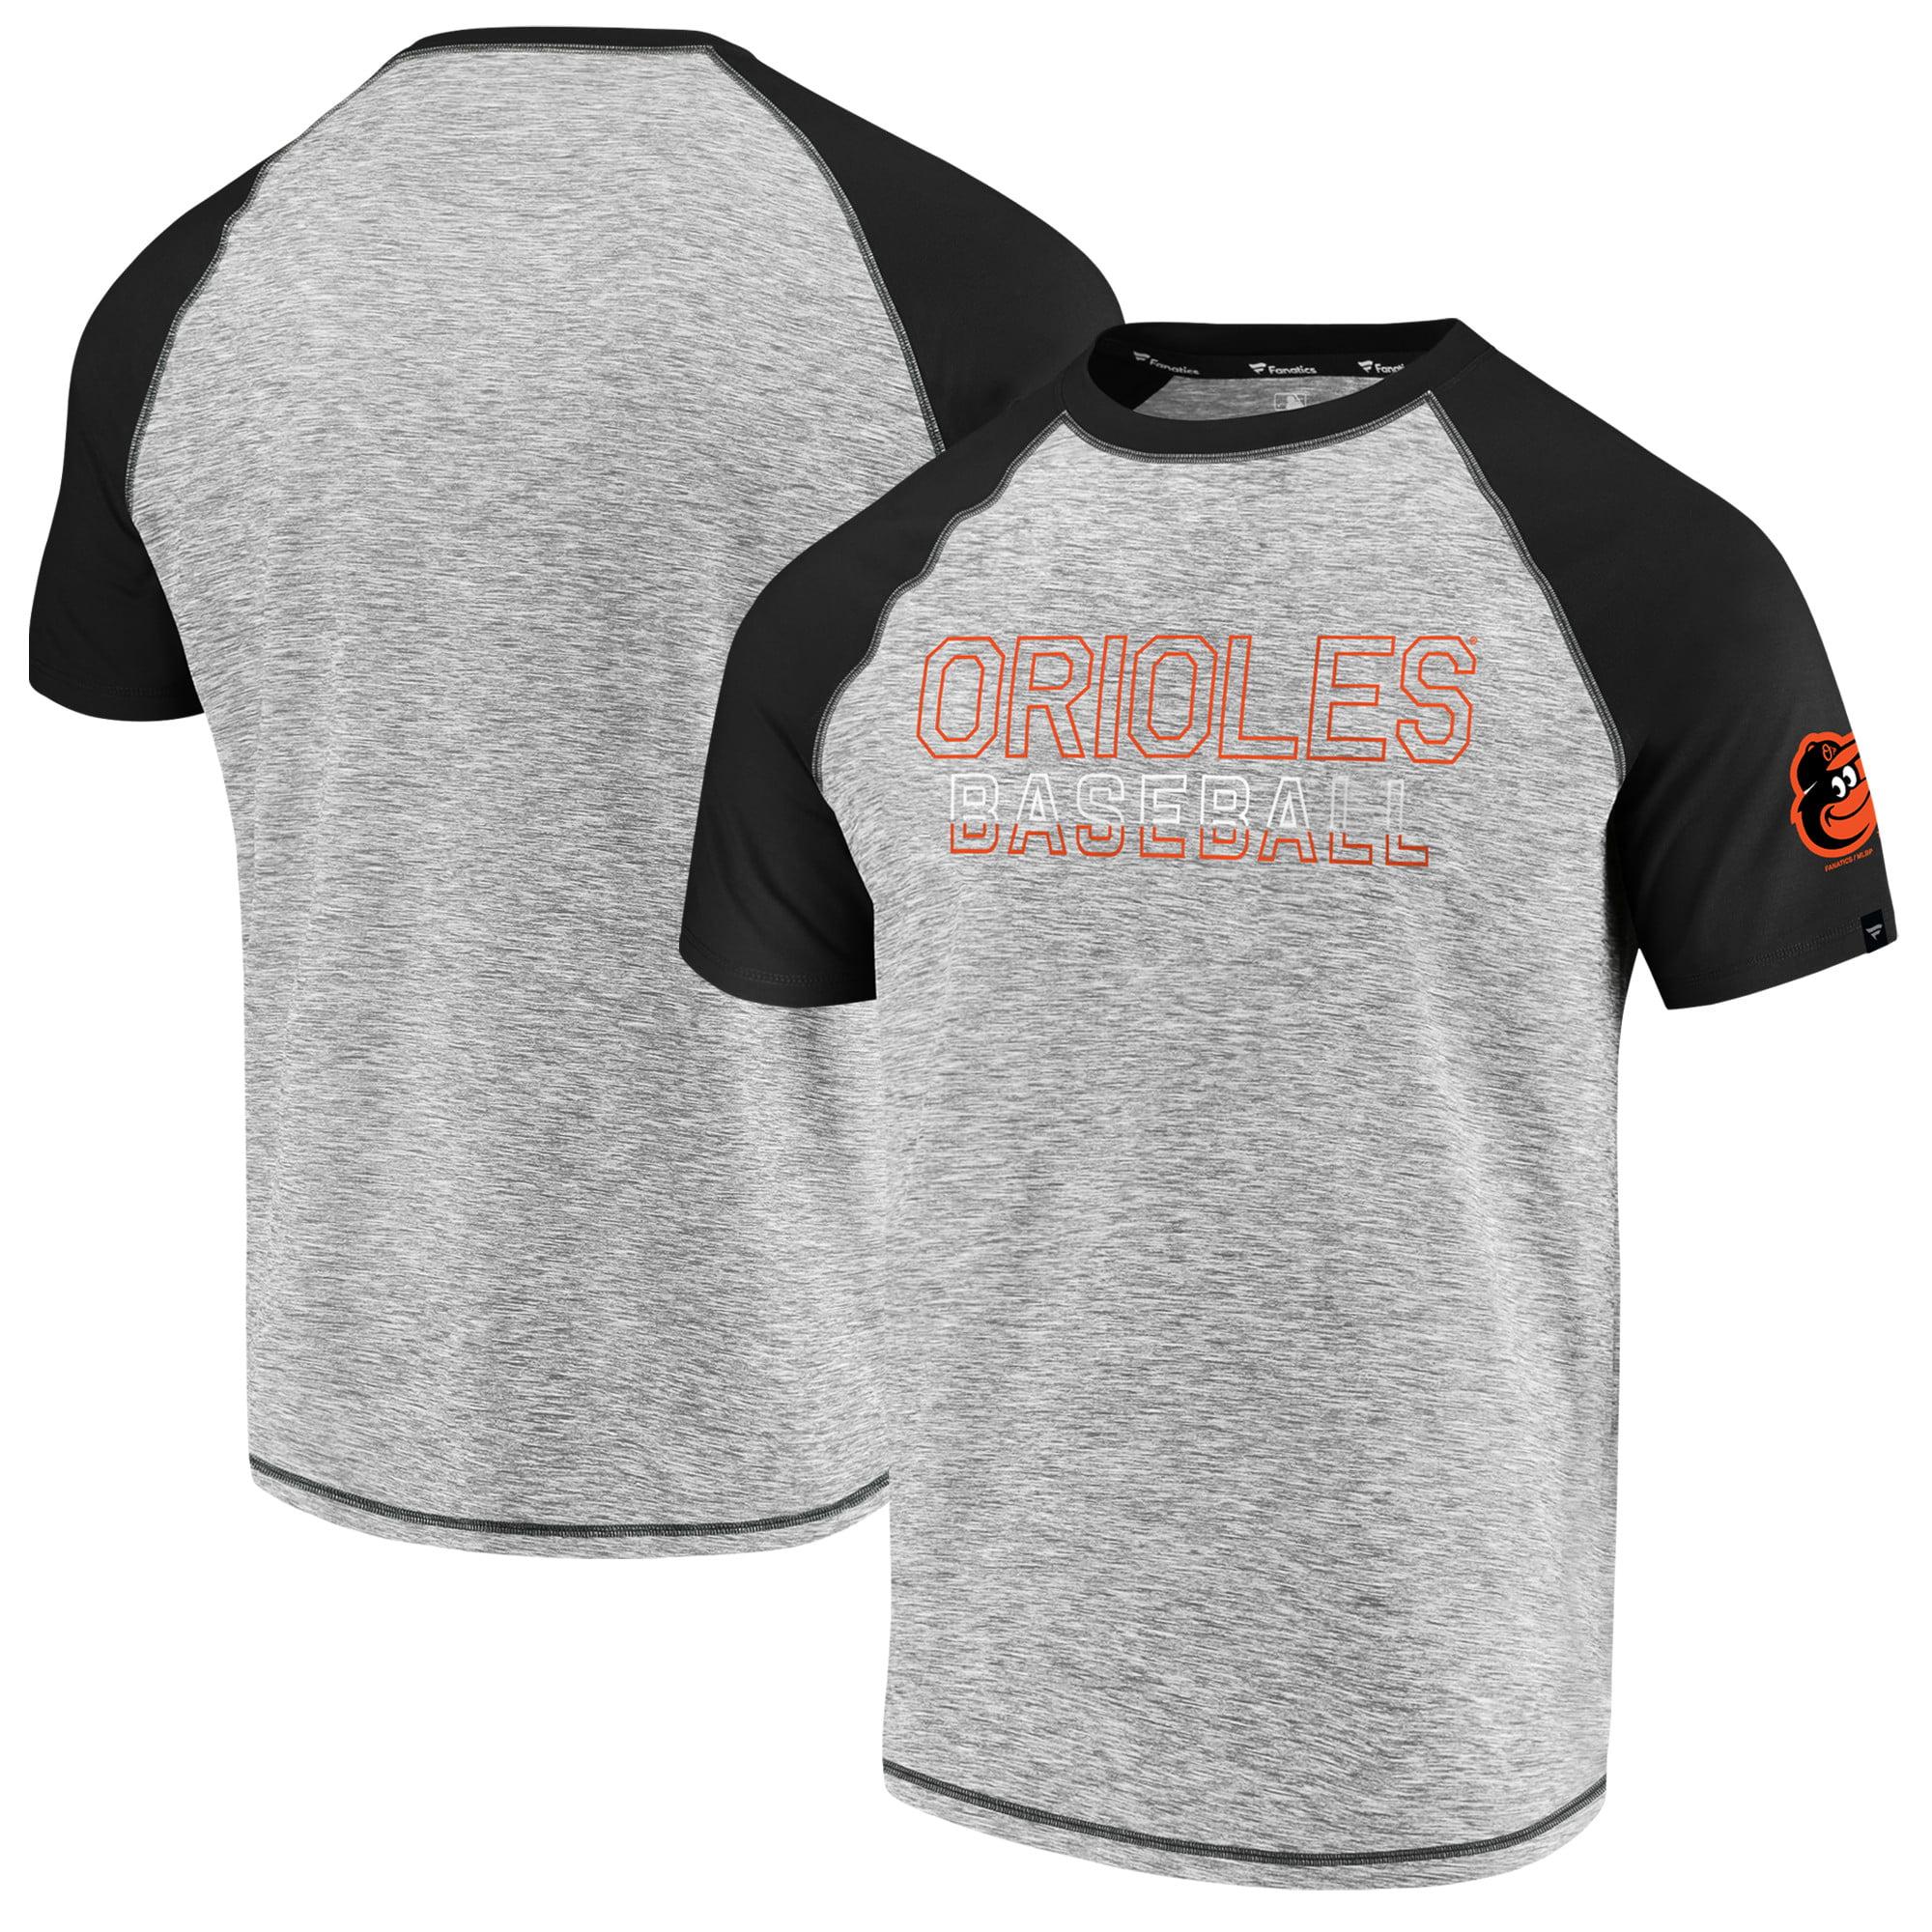 Baltimore Orioles Fanatics Branded Made to Move Raglan T-Shirt - Heathered Gray/Black